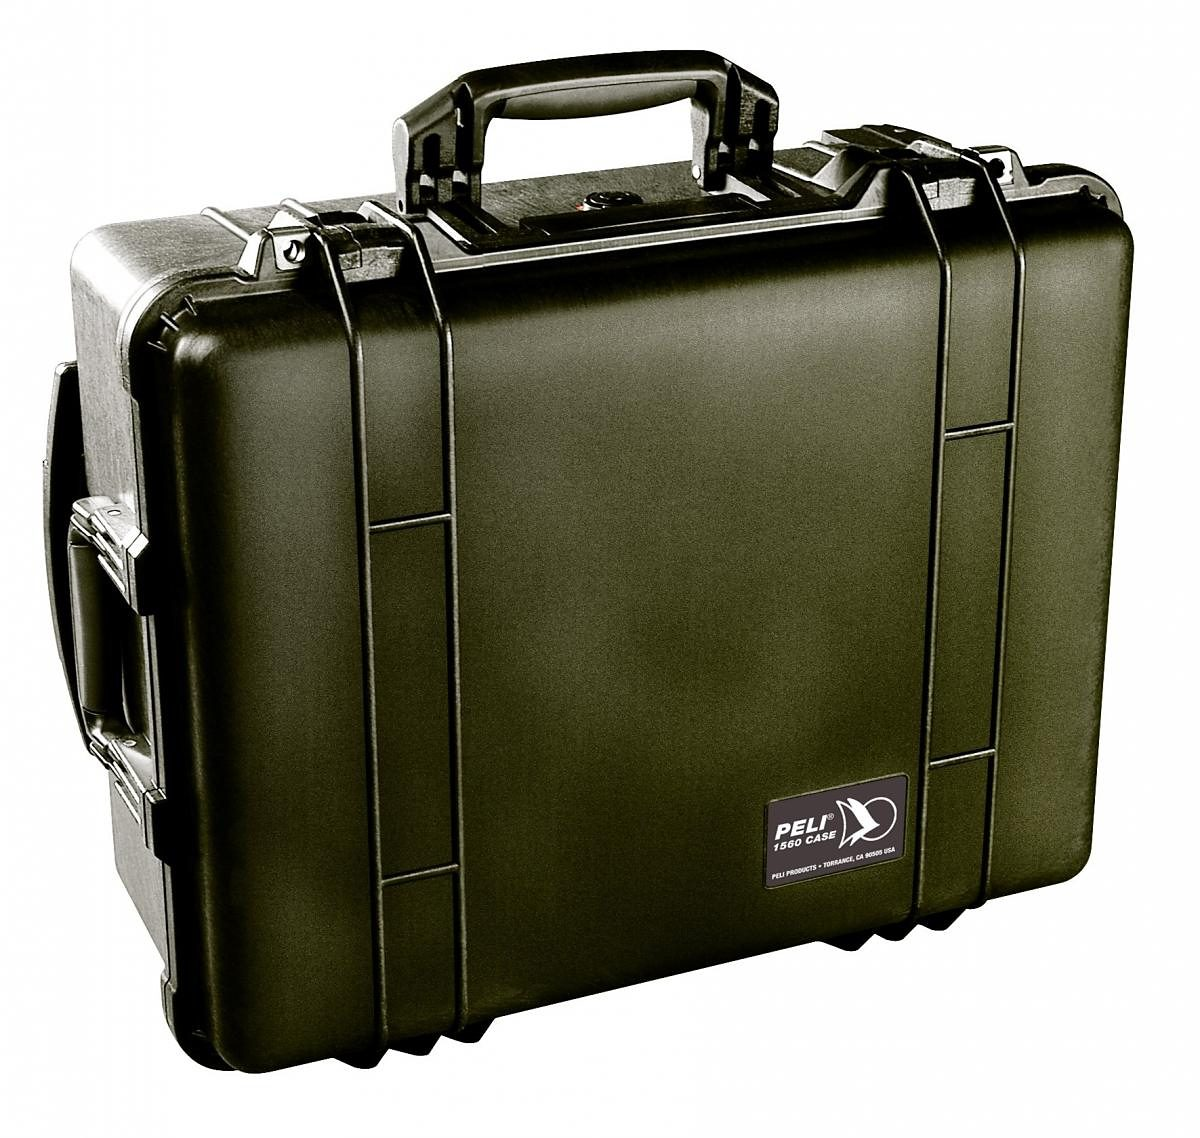 Peli Campingtruhe & -Kiste »Flightcase 1560 ohne Schaum«